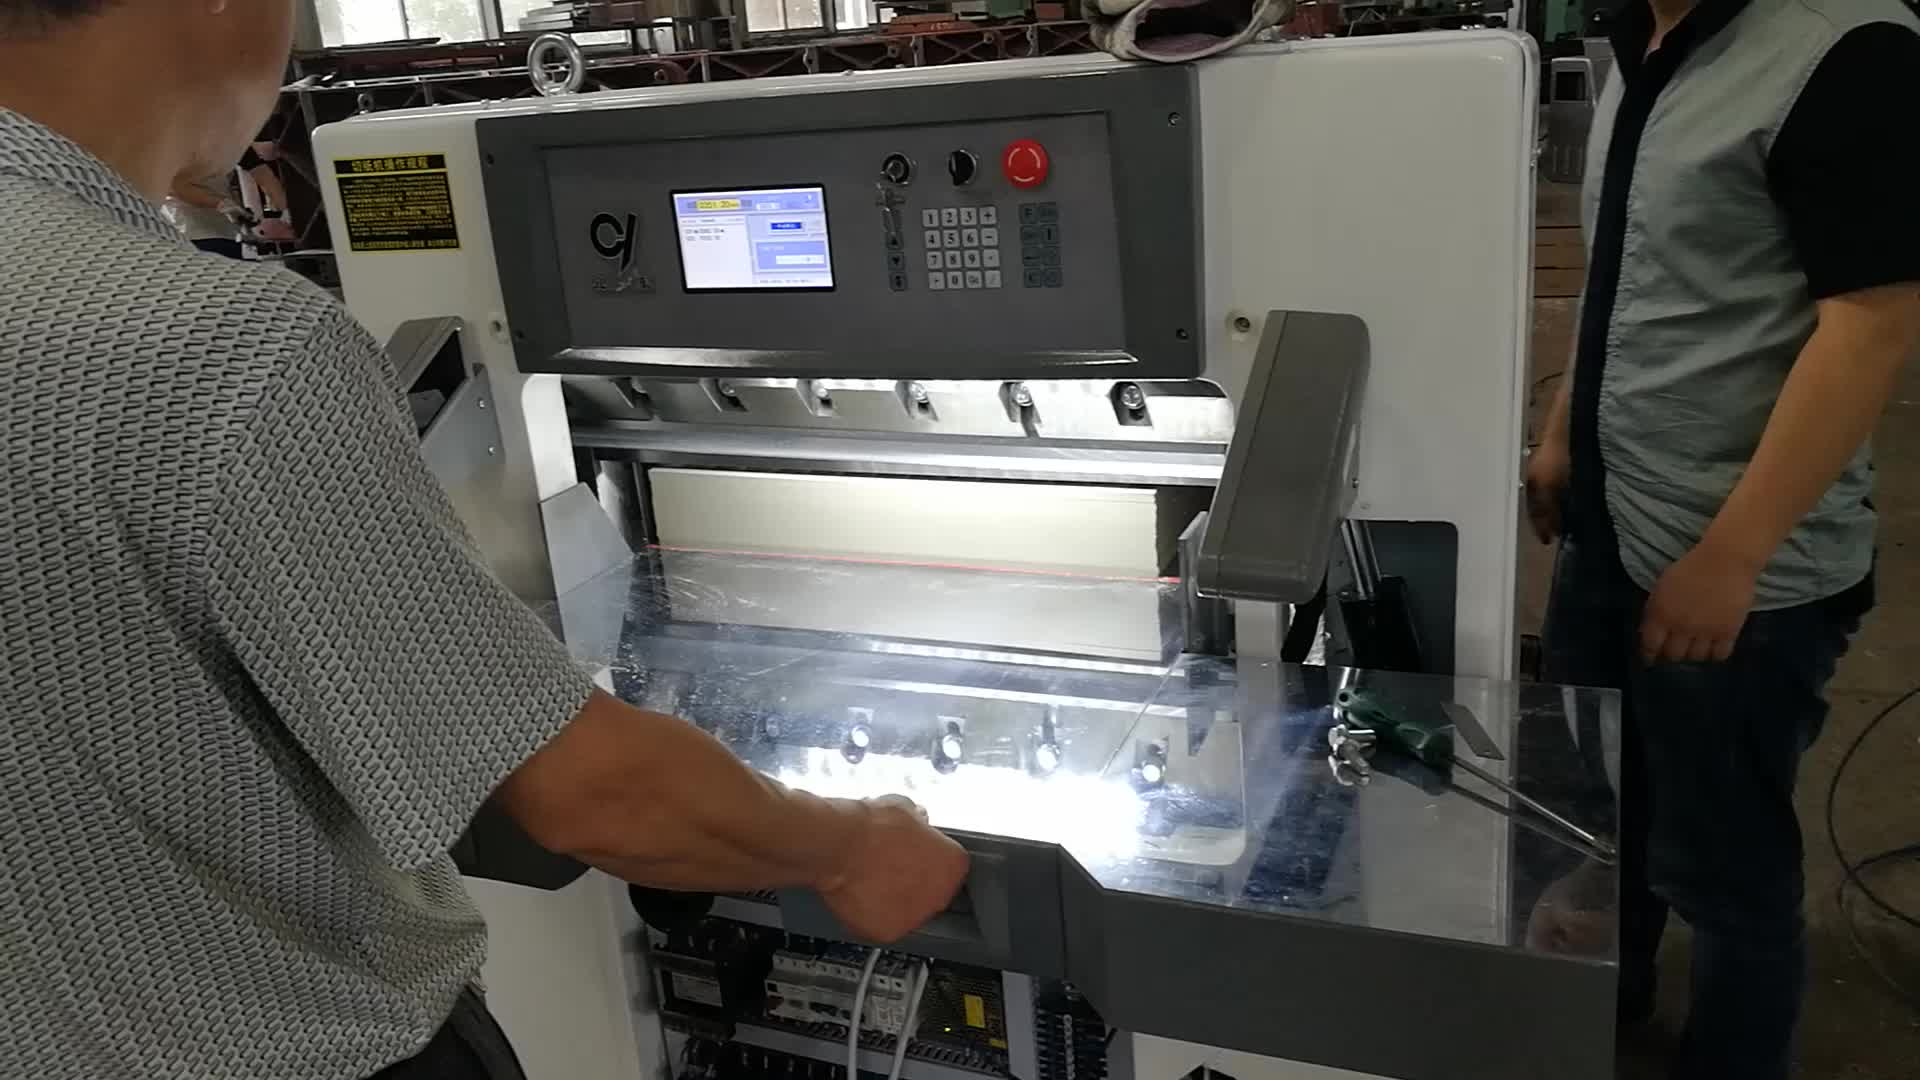 QZK670 Yüksek hassasiyetli Ofis otomatik elektrik kağıt kesici